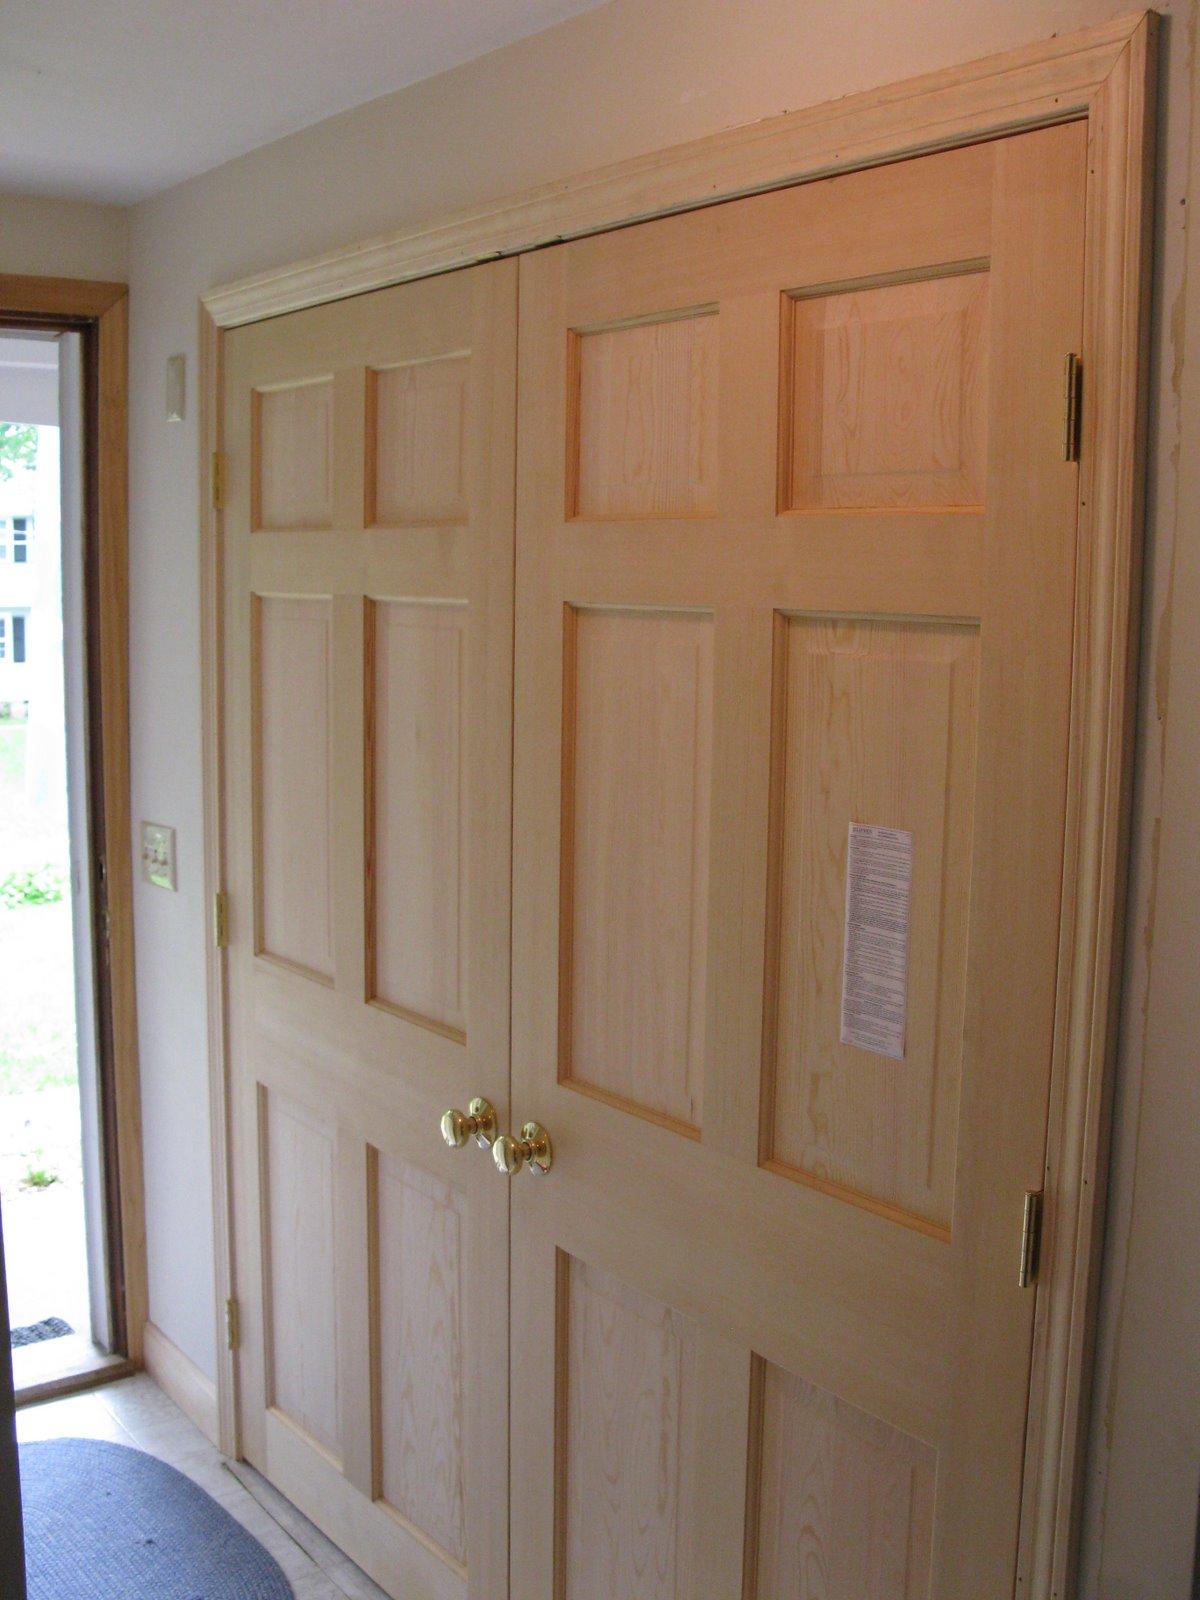 Closet Door Upgrade A Concord Carpenter